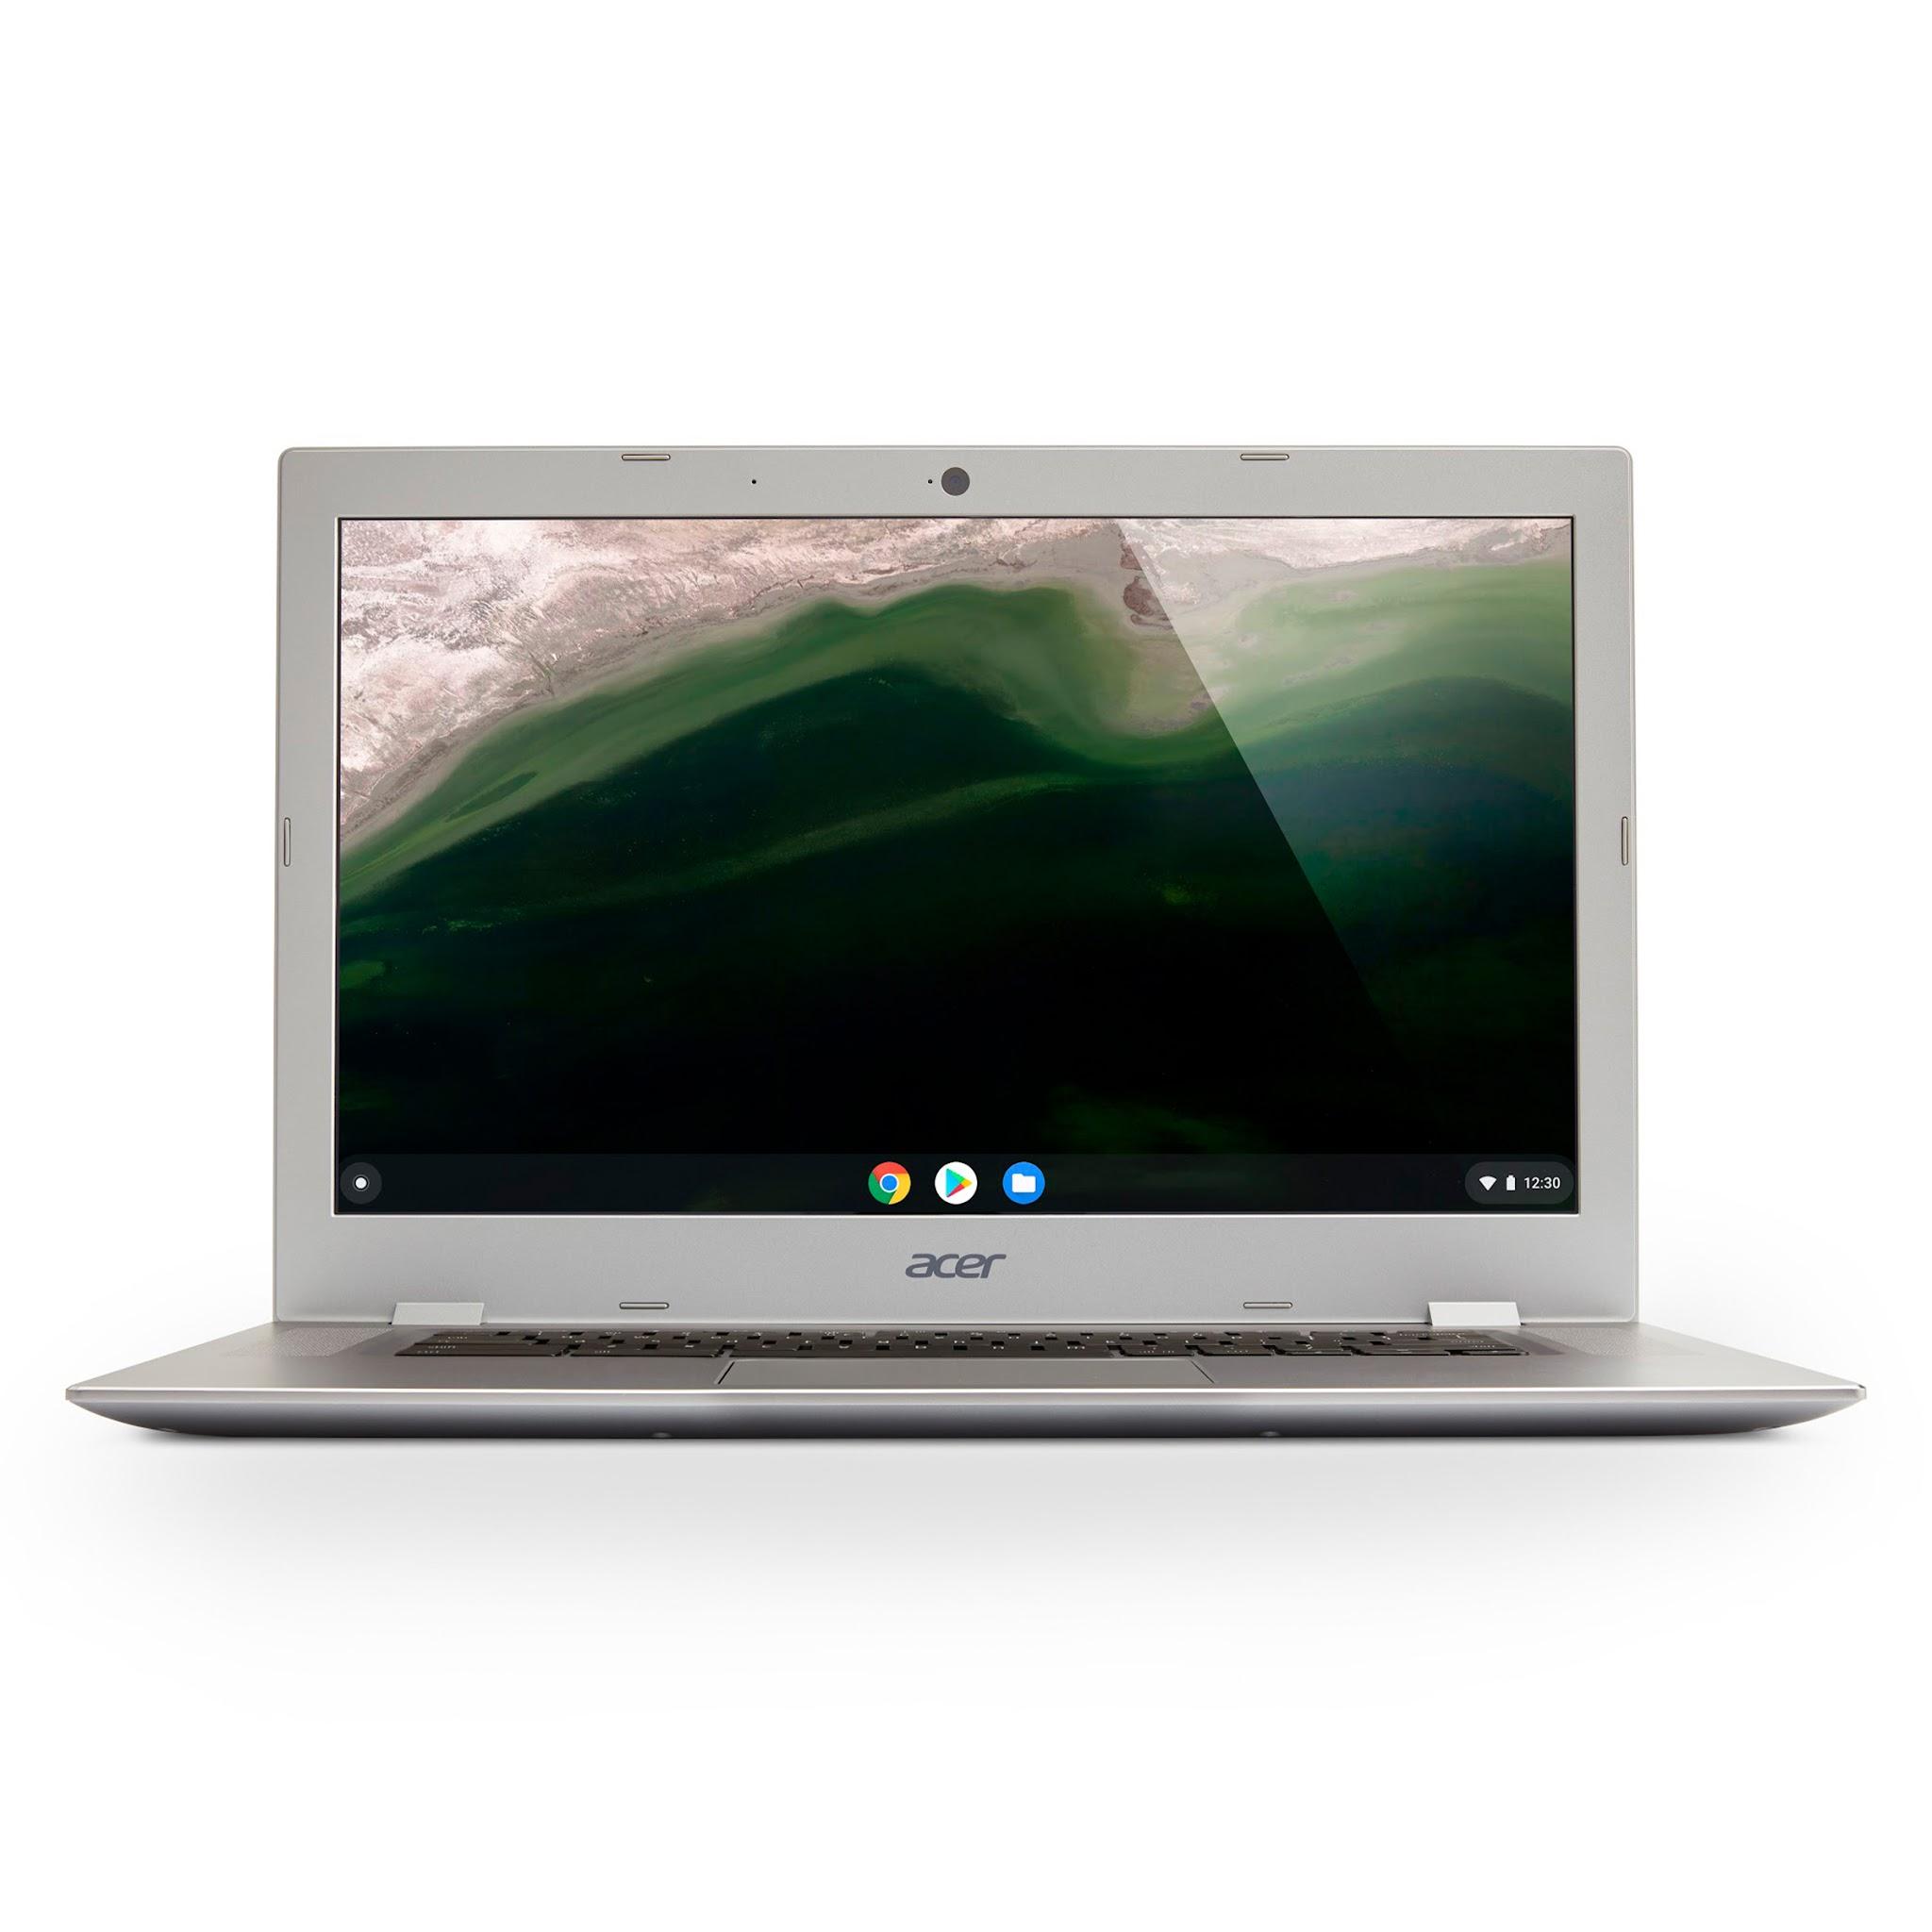 Acer Chromebook 15 (CB315-1HT) - photo 1